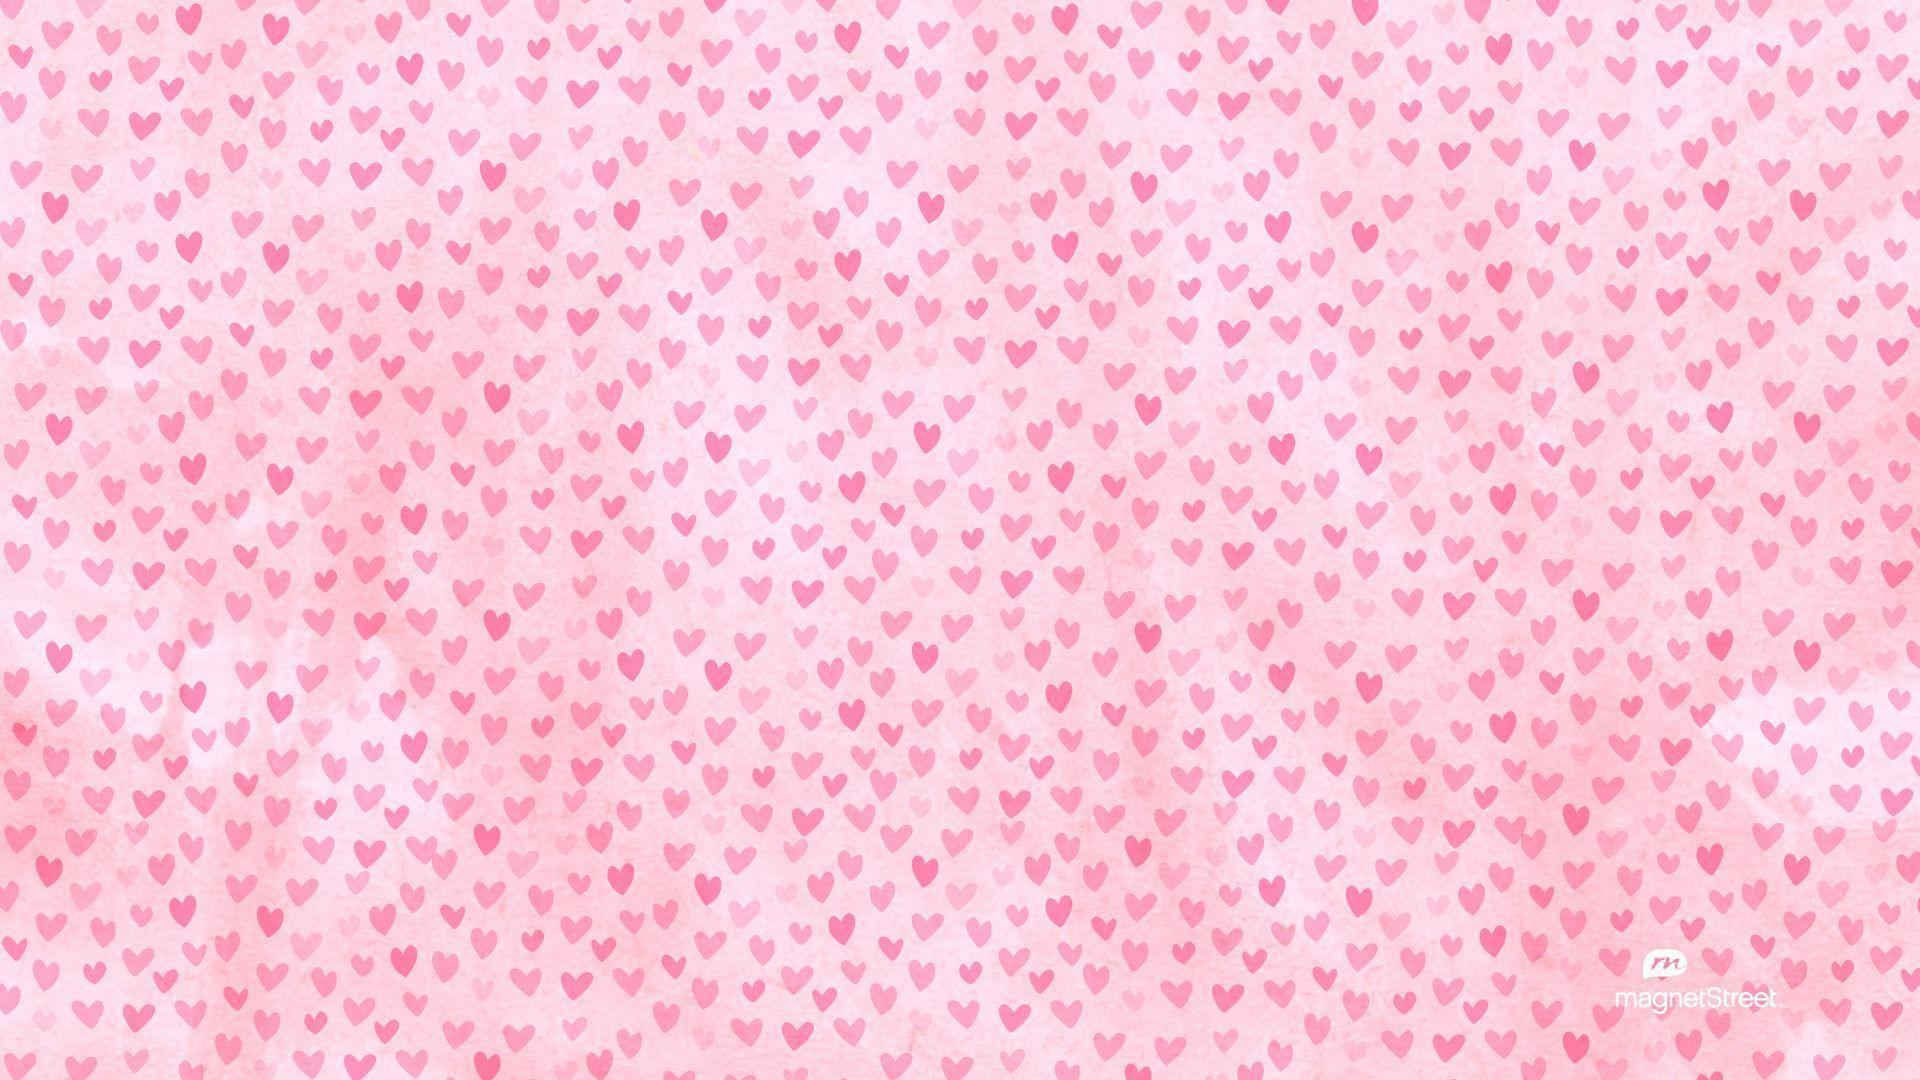 wallpaper texture hearts 1280 - photo #13